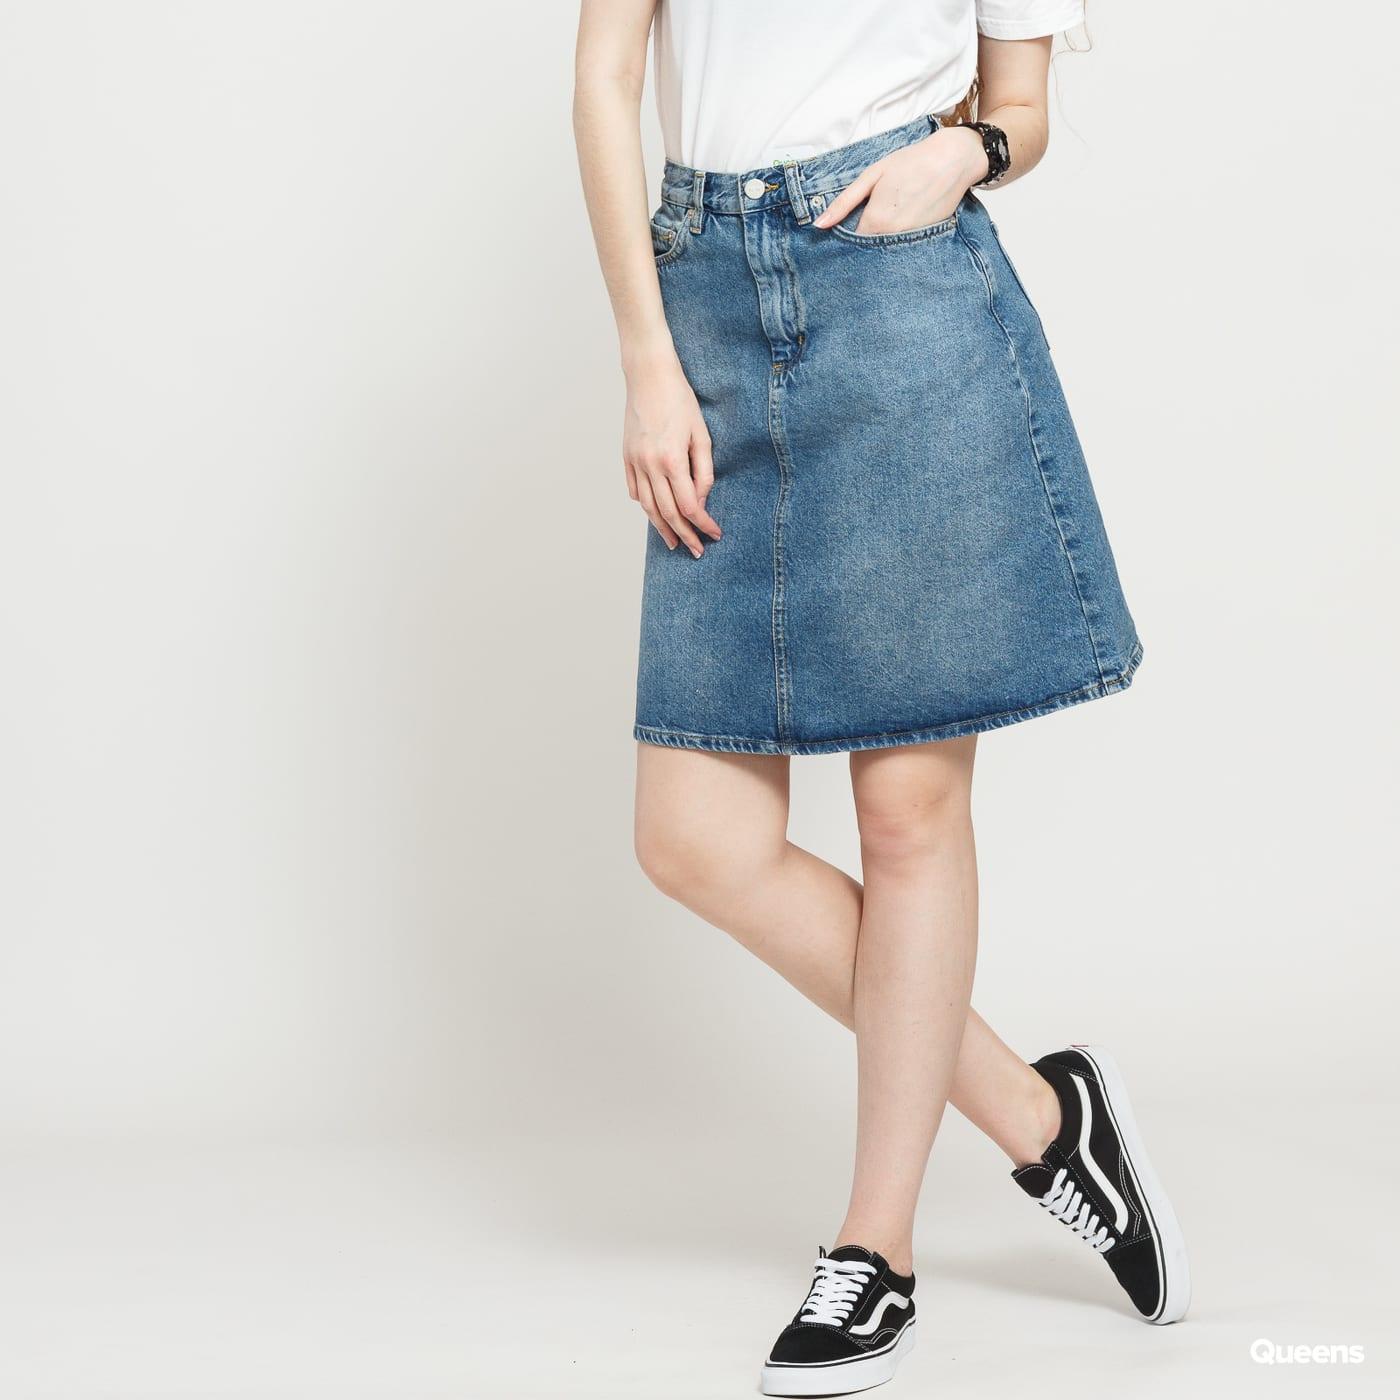 WOOD WOOD Ynes Skirt classic blue vintage